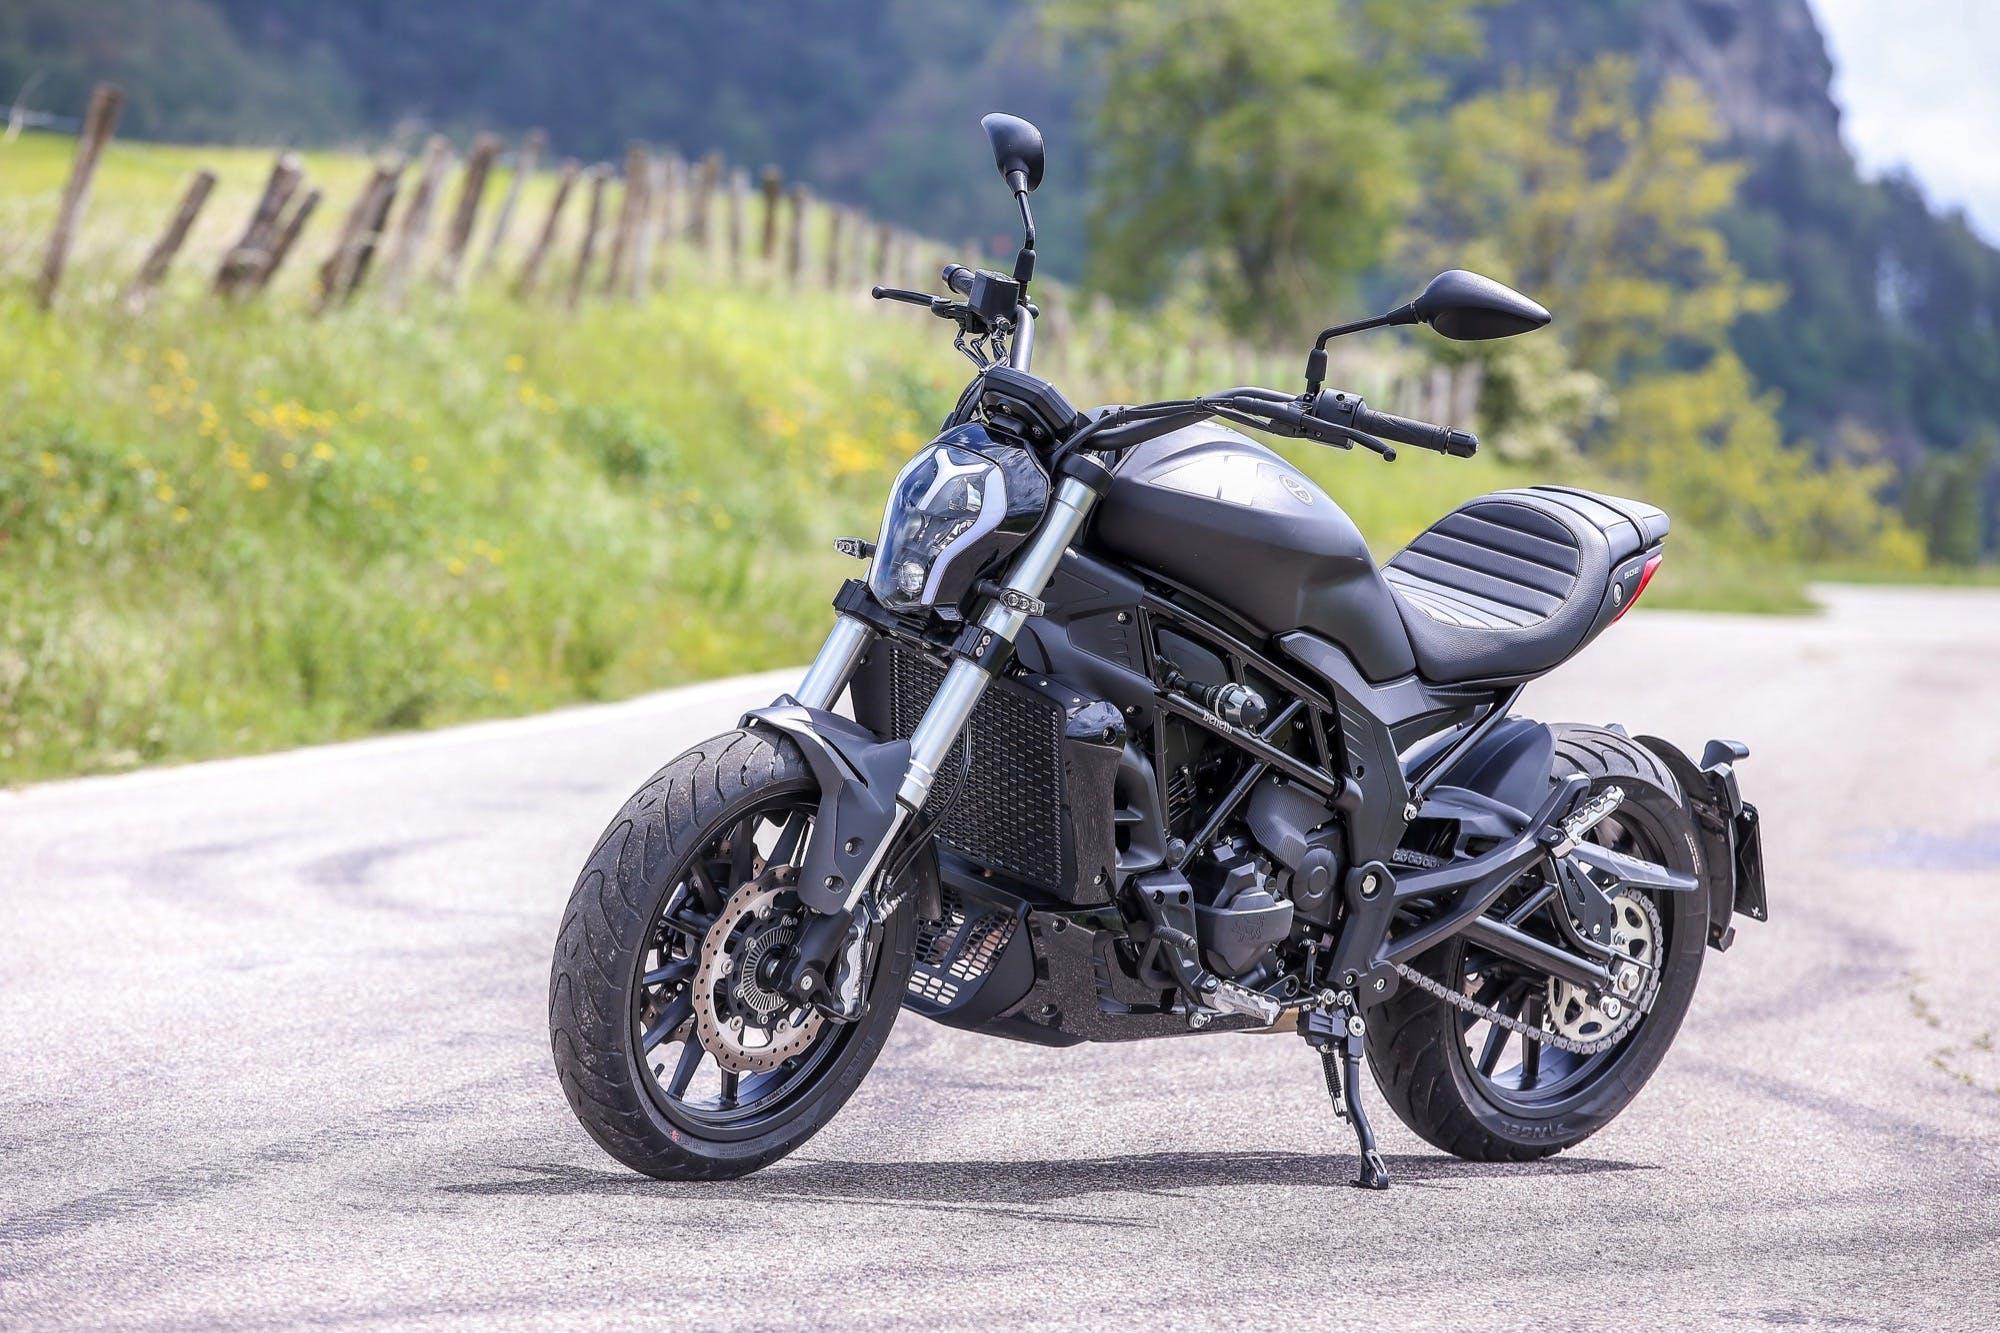 Benelli 502 C moto per neopatentati A2 nera